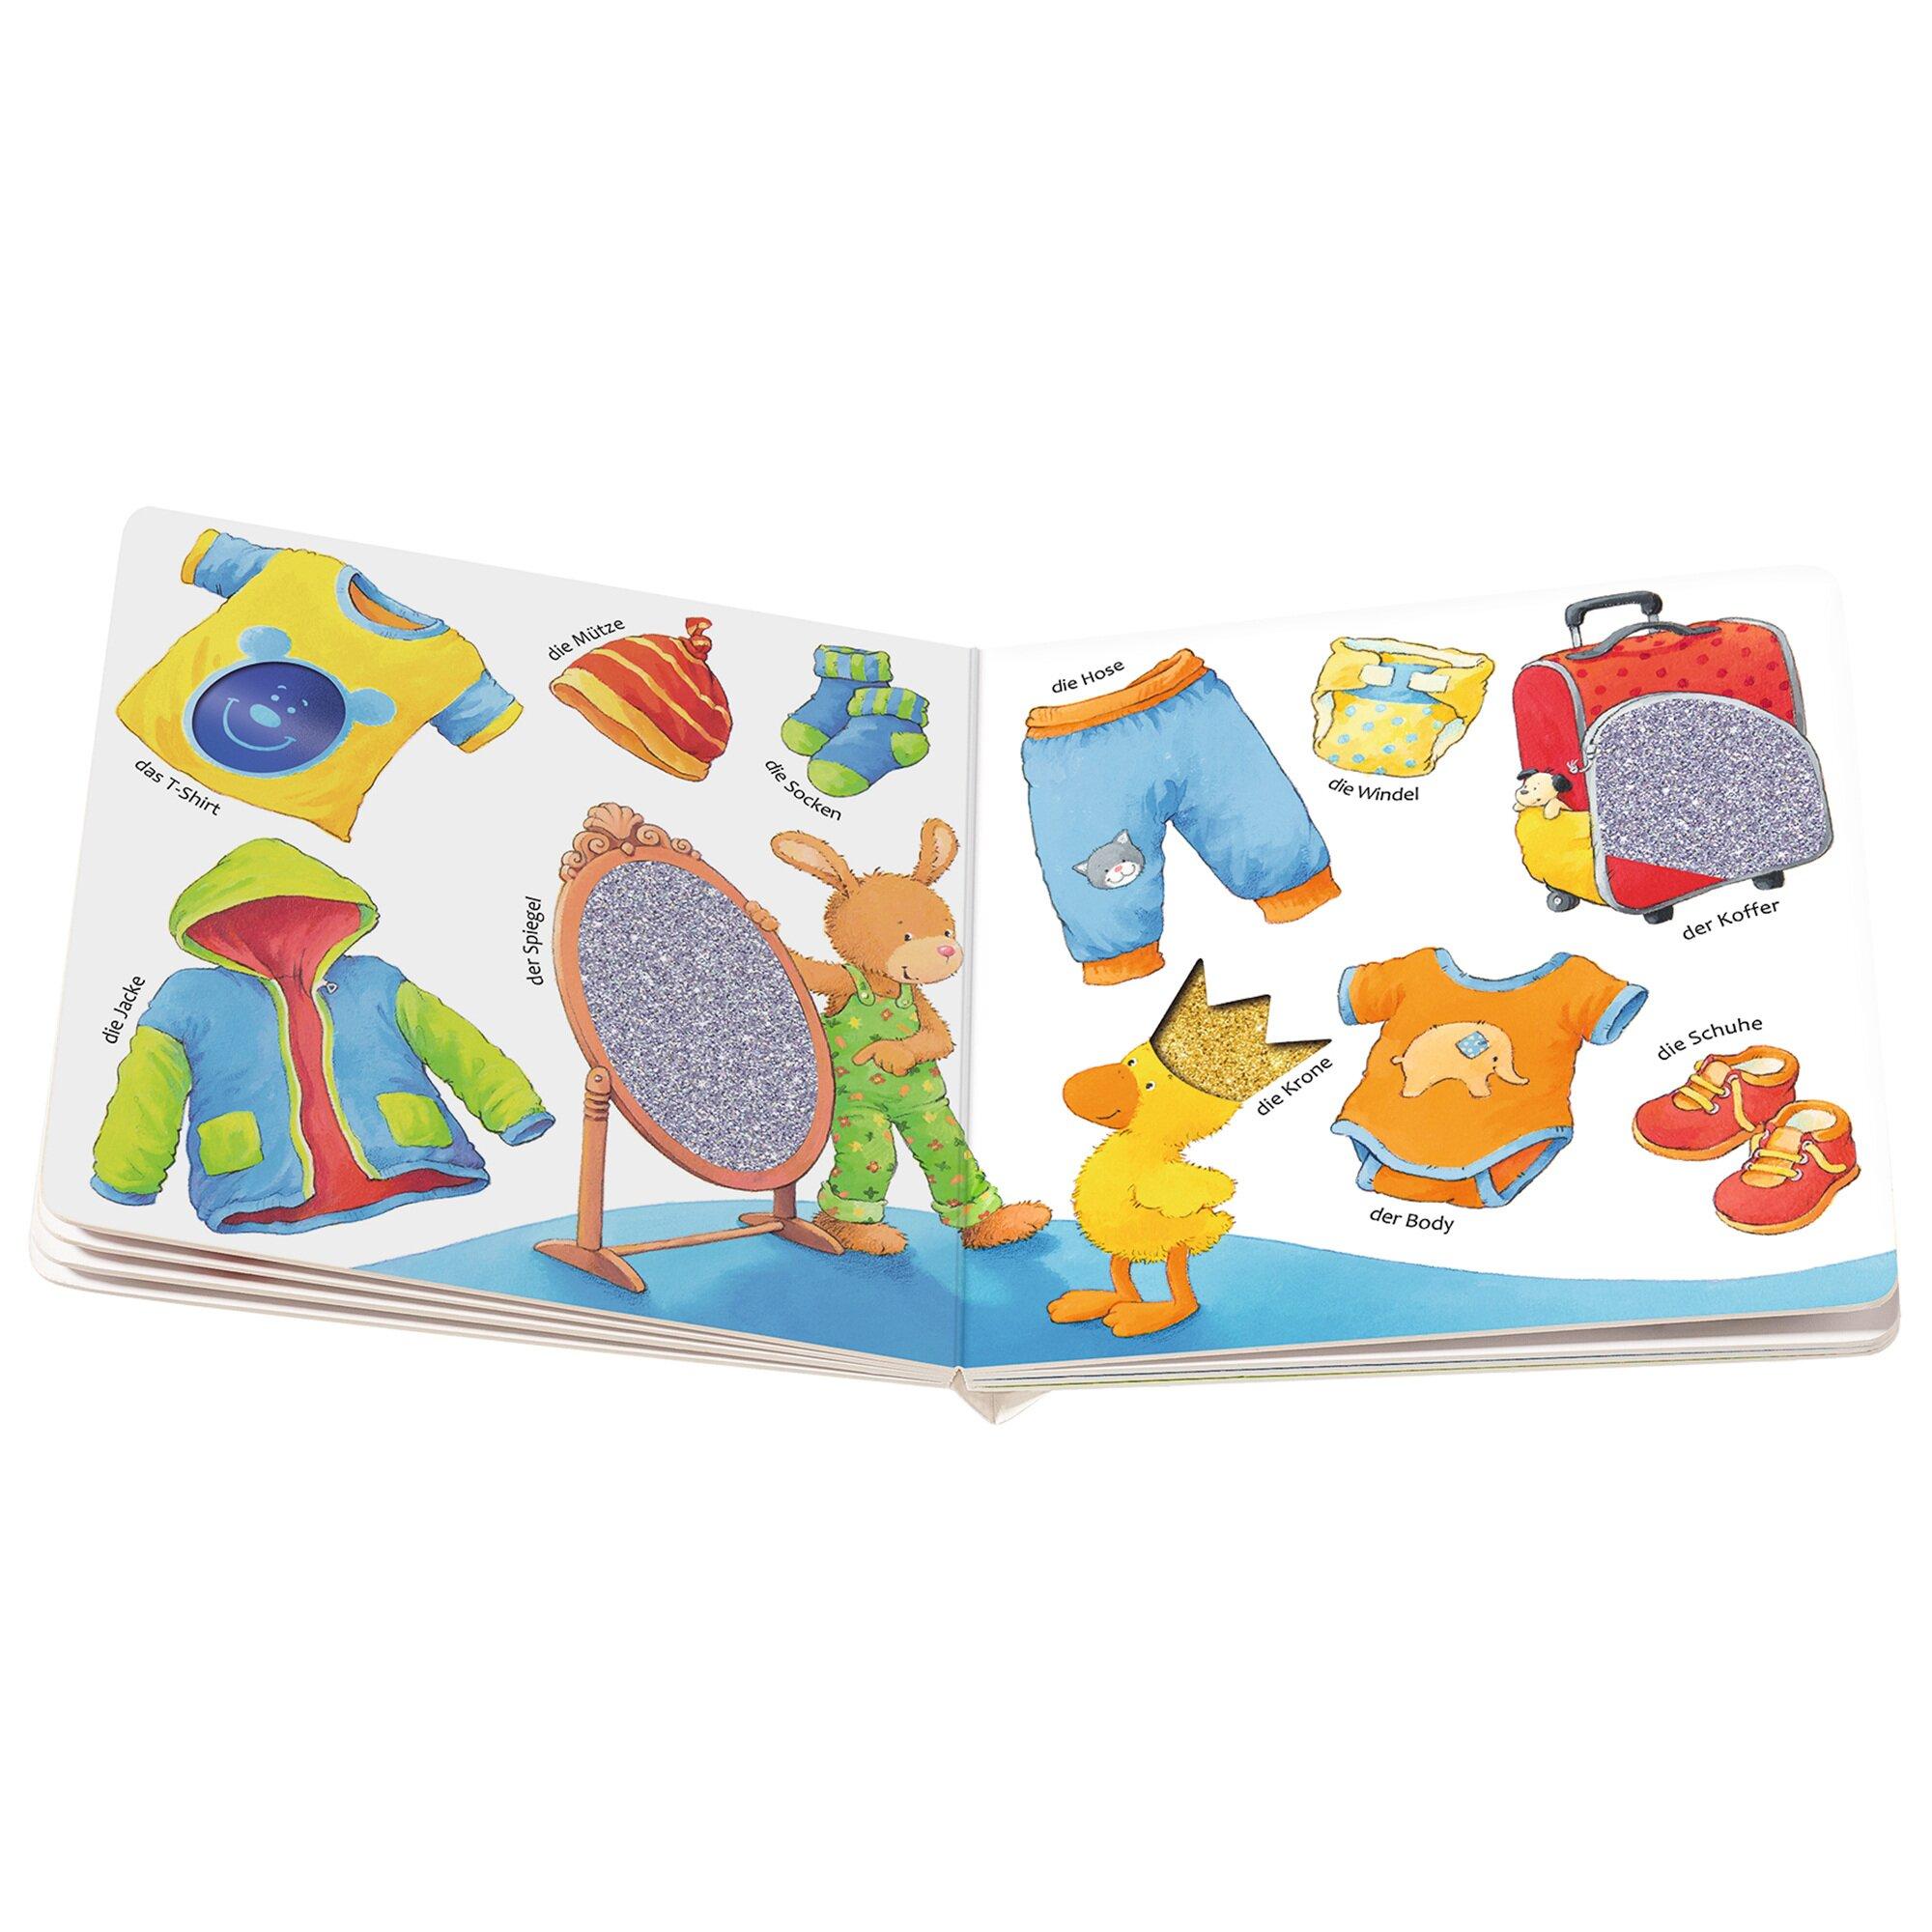 ministeps-worterbuch-alles-glitzert-alles-glanzt